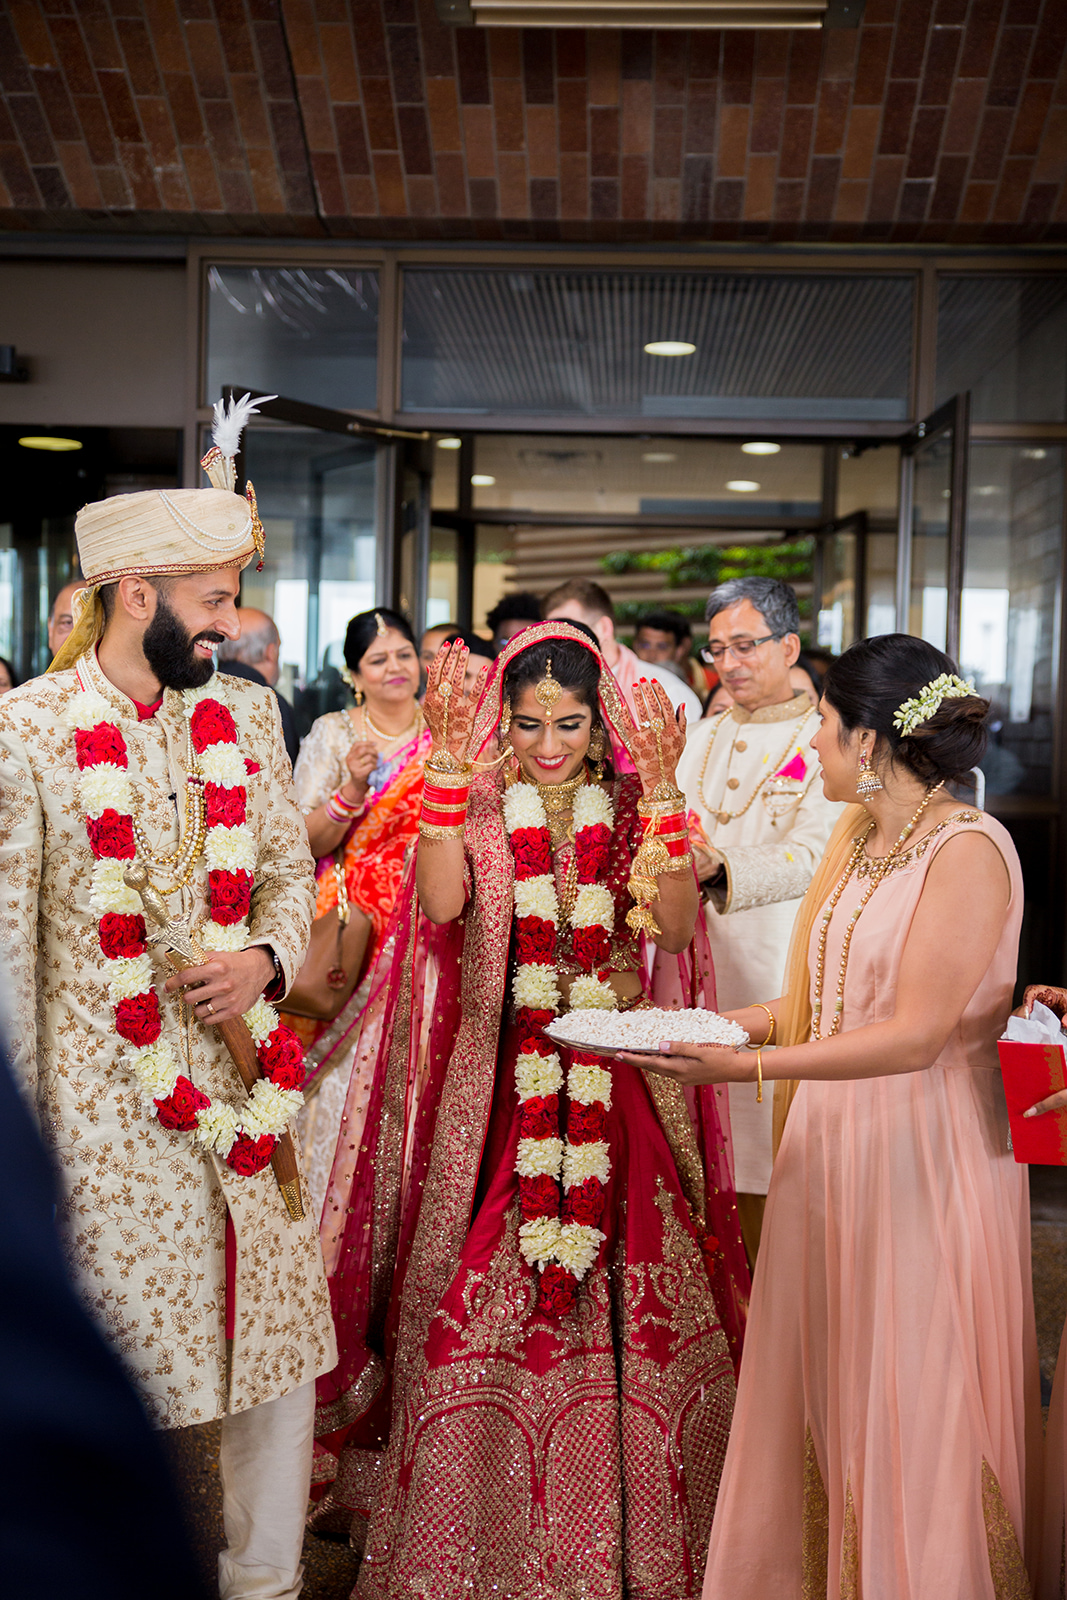 Le Cape Weddings - Sumeet and Chavi - Vidai --8.jpg